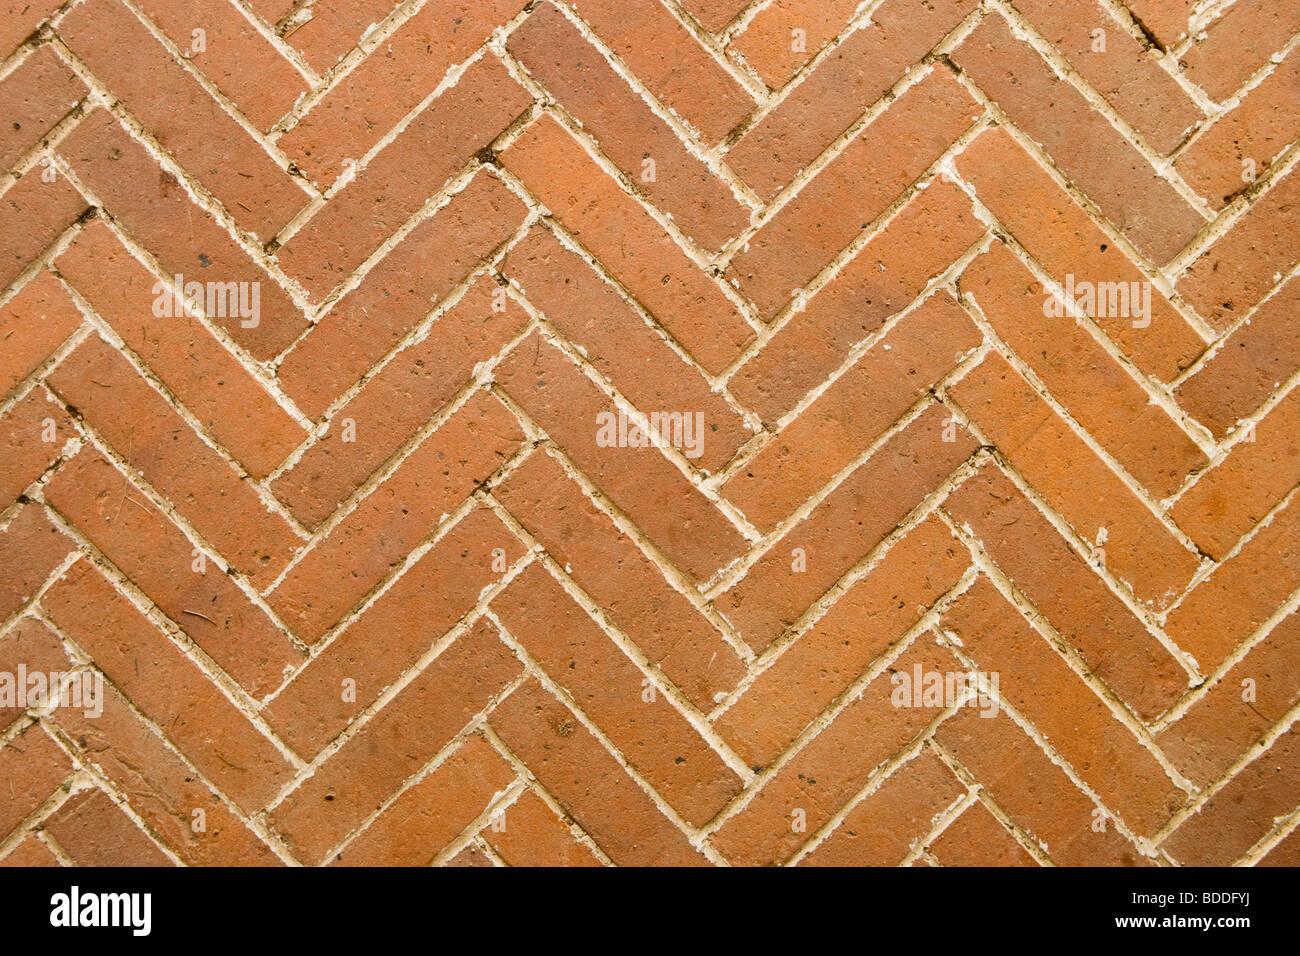 Brick Paver Patterns Brick Paving In Herringbone Pattern Stock Photo Royalty Free